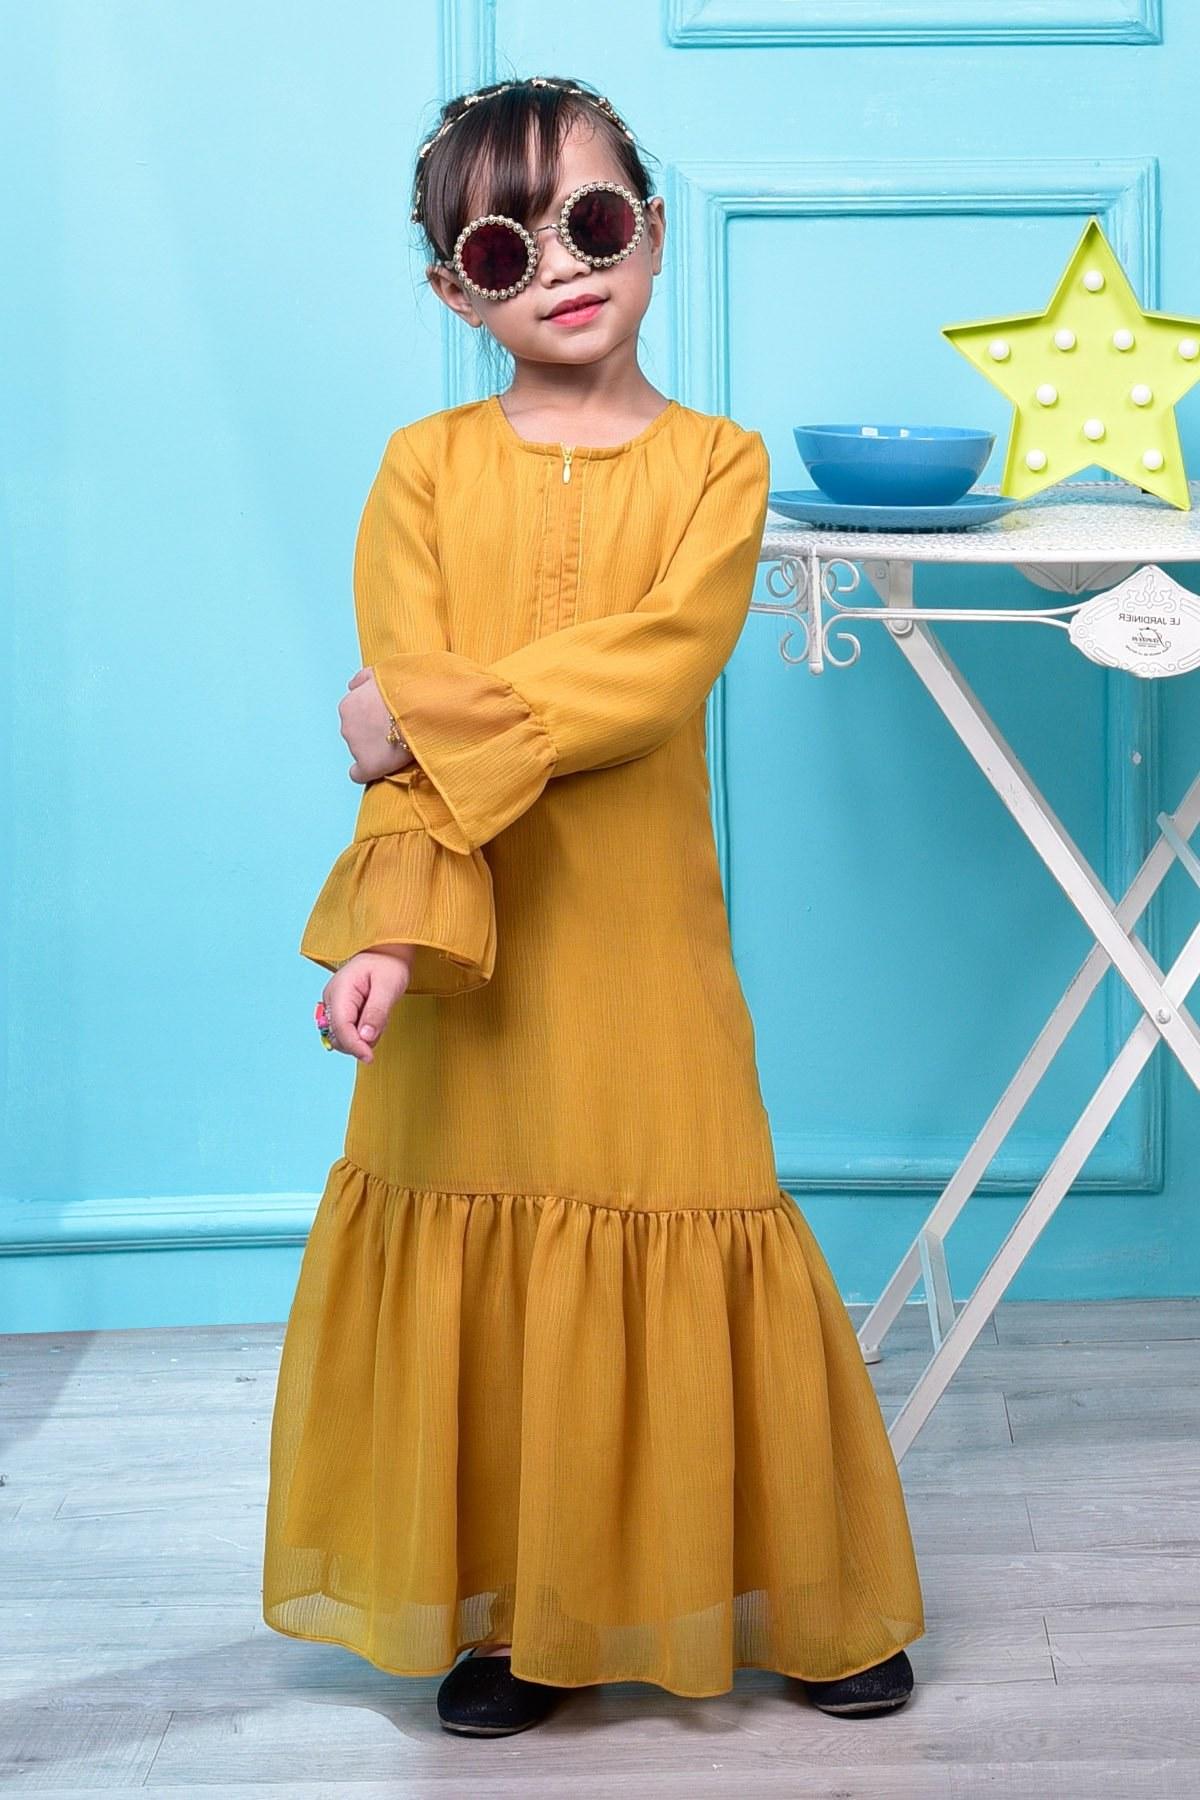 Inspirasi Model Baju Bridesmaid Hijab 2018 87dx Abaya Mayangsari Kids Cream Mustard